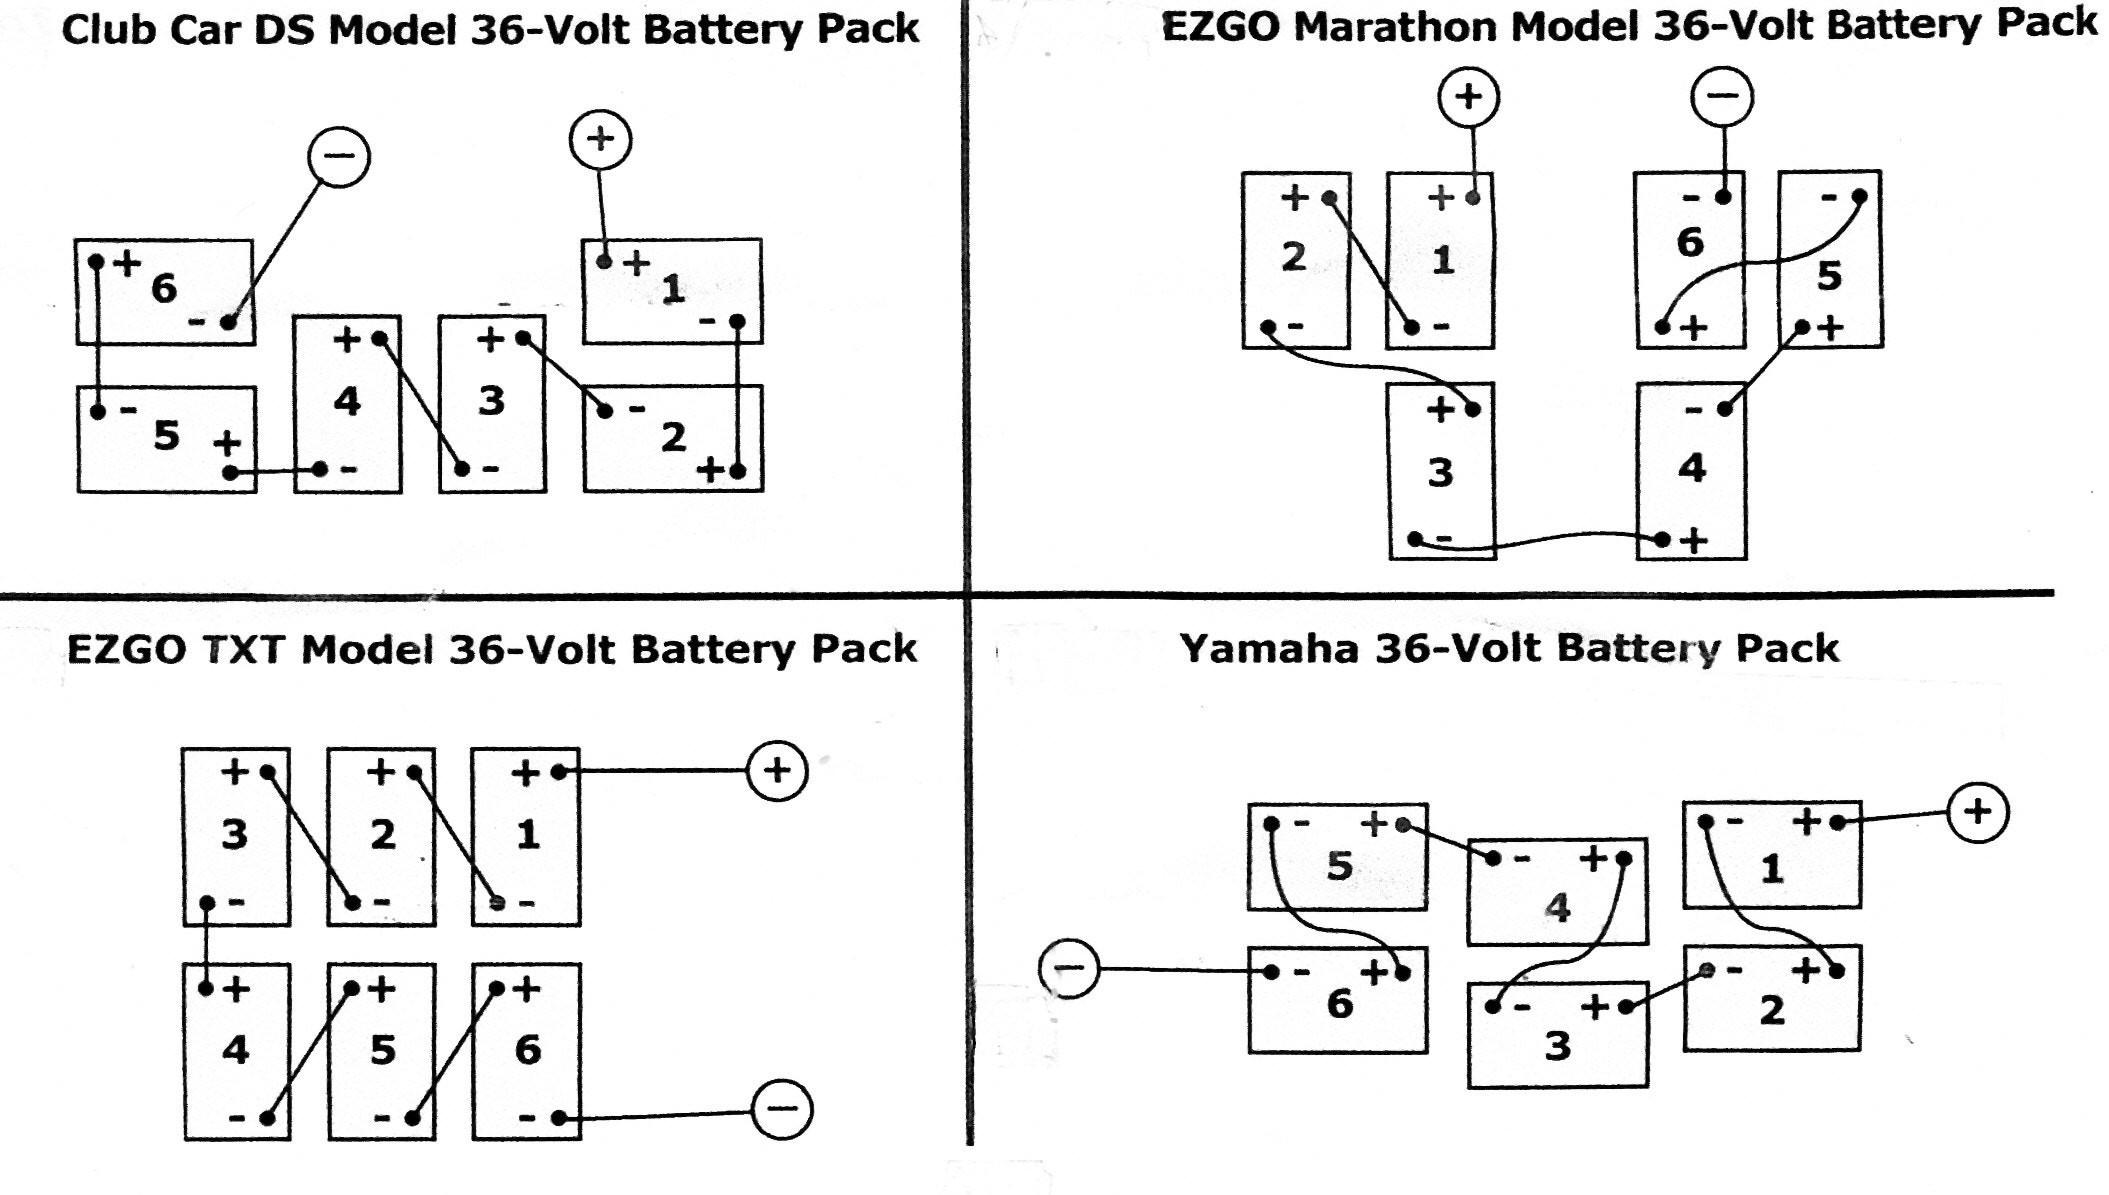 Wiring Diagrams for Yamaha Golf Carts Refrence Ez Golf Cart Battery Wiring Diagram Western Ingersoll Rand